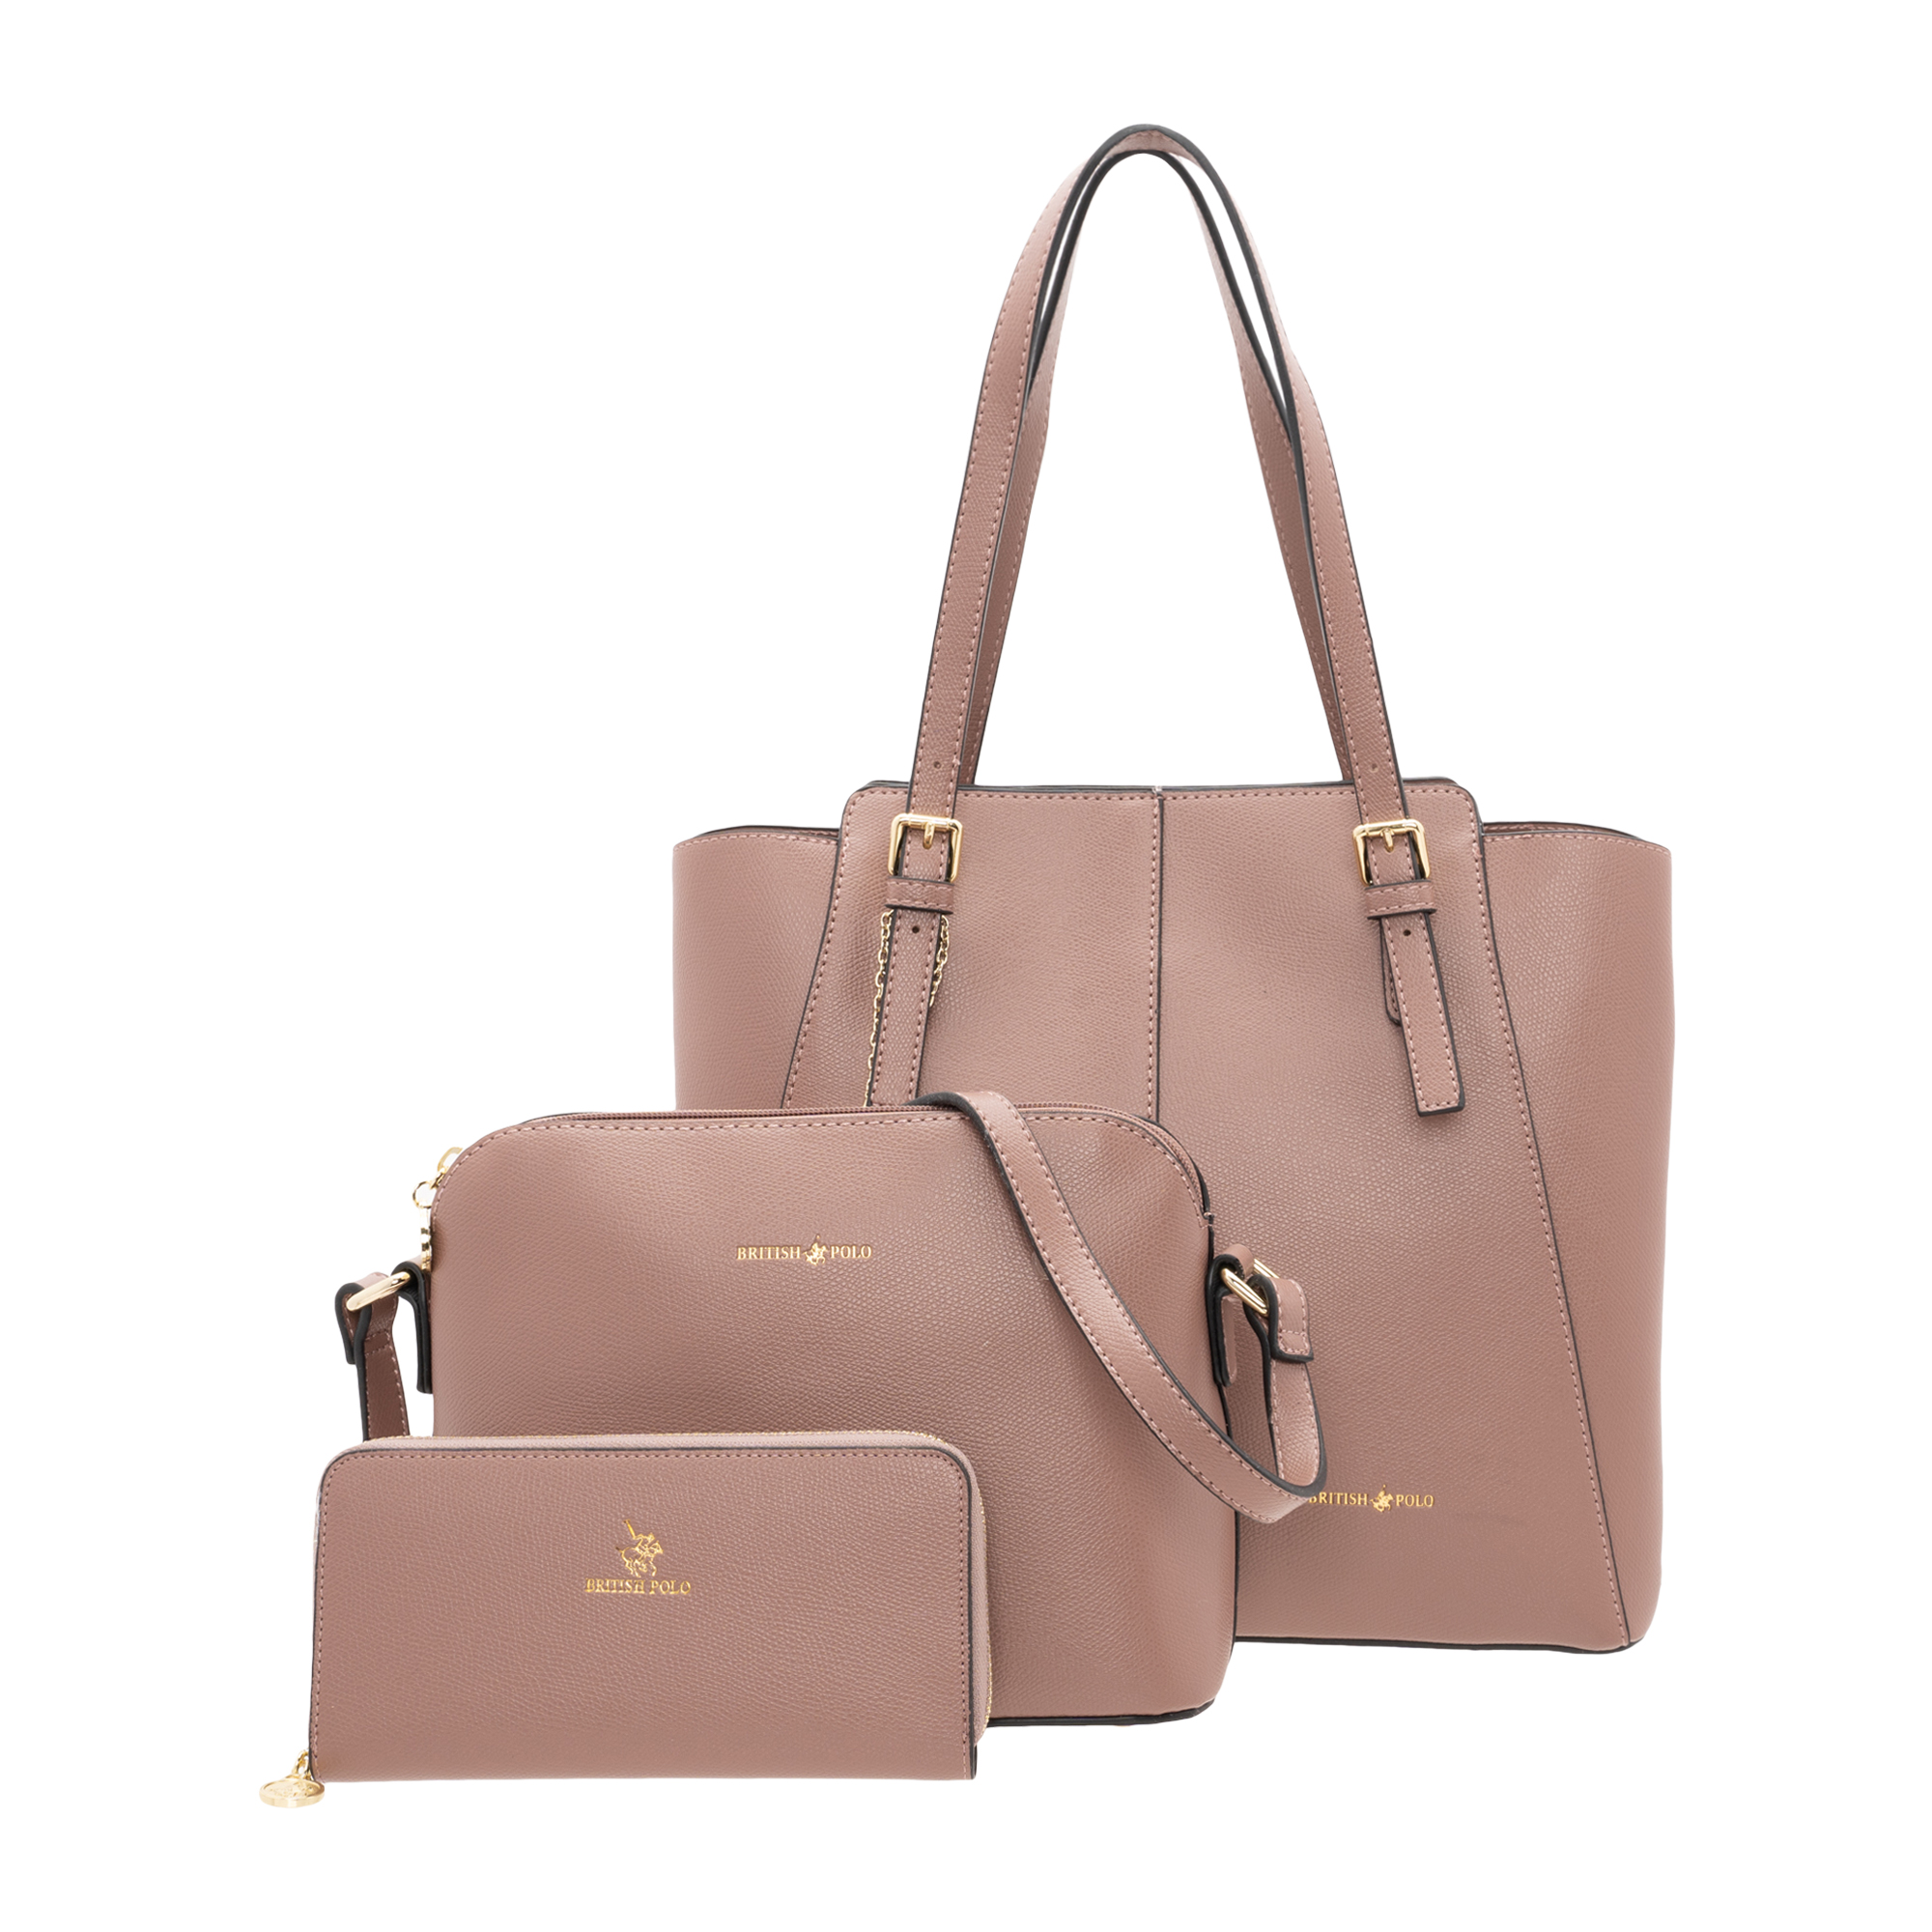 British Polo Authentics (II) 3 In 1 Bag Set